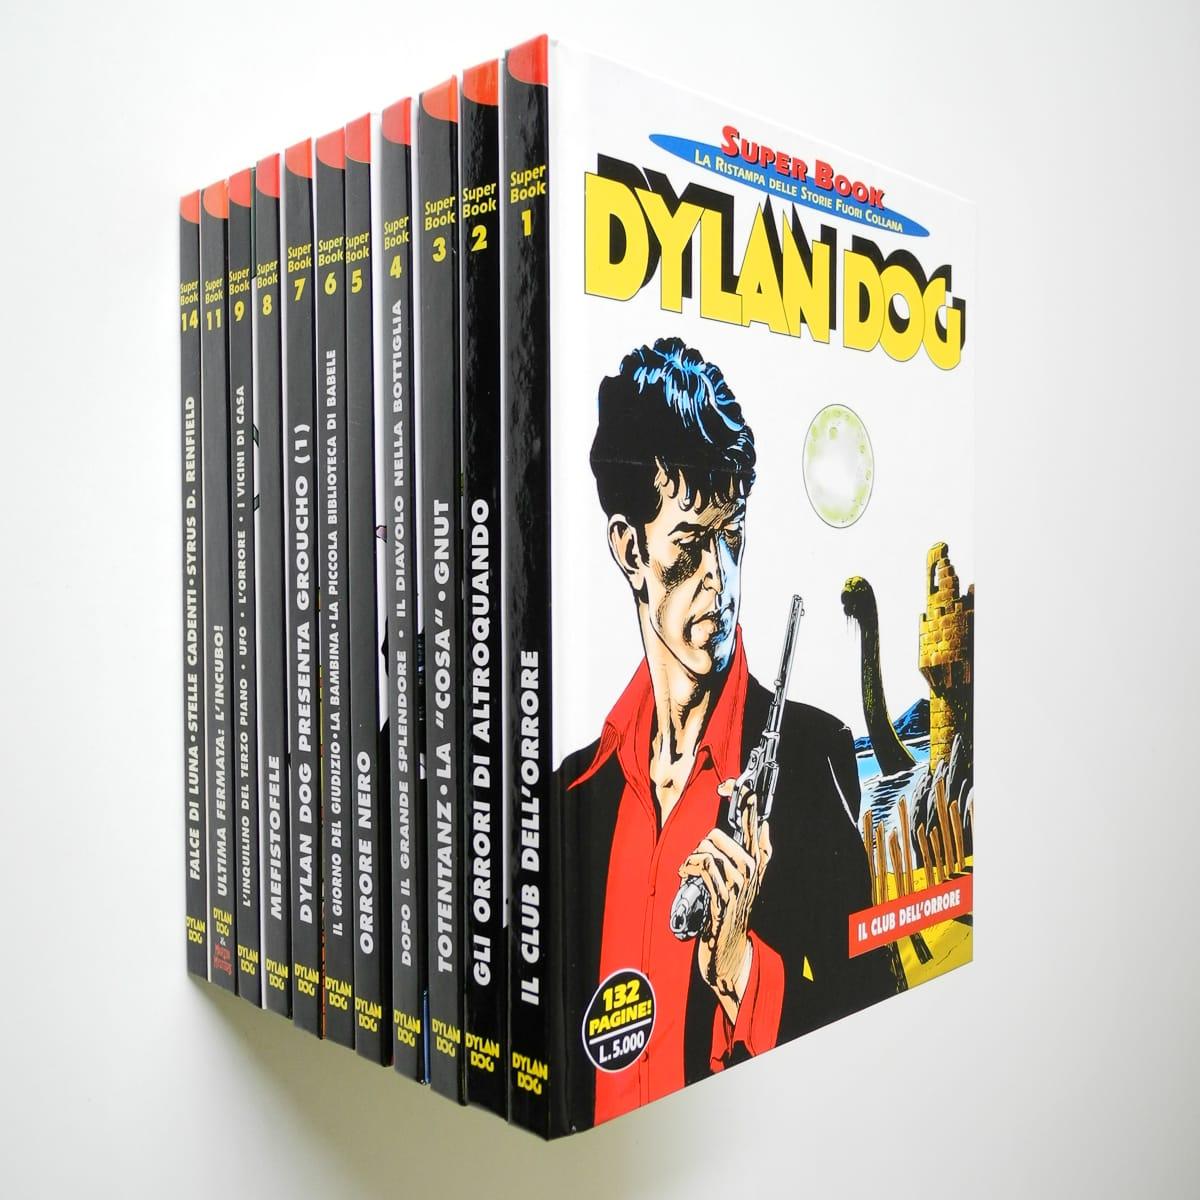 Dylan Dog Super Book sequenza completa n. 1/9, 11, 14 Bonelli